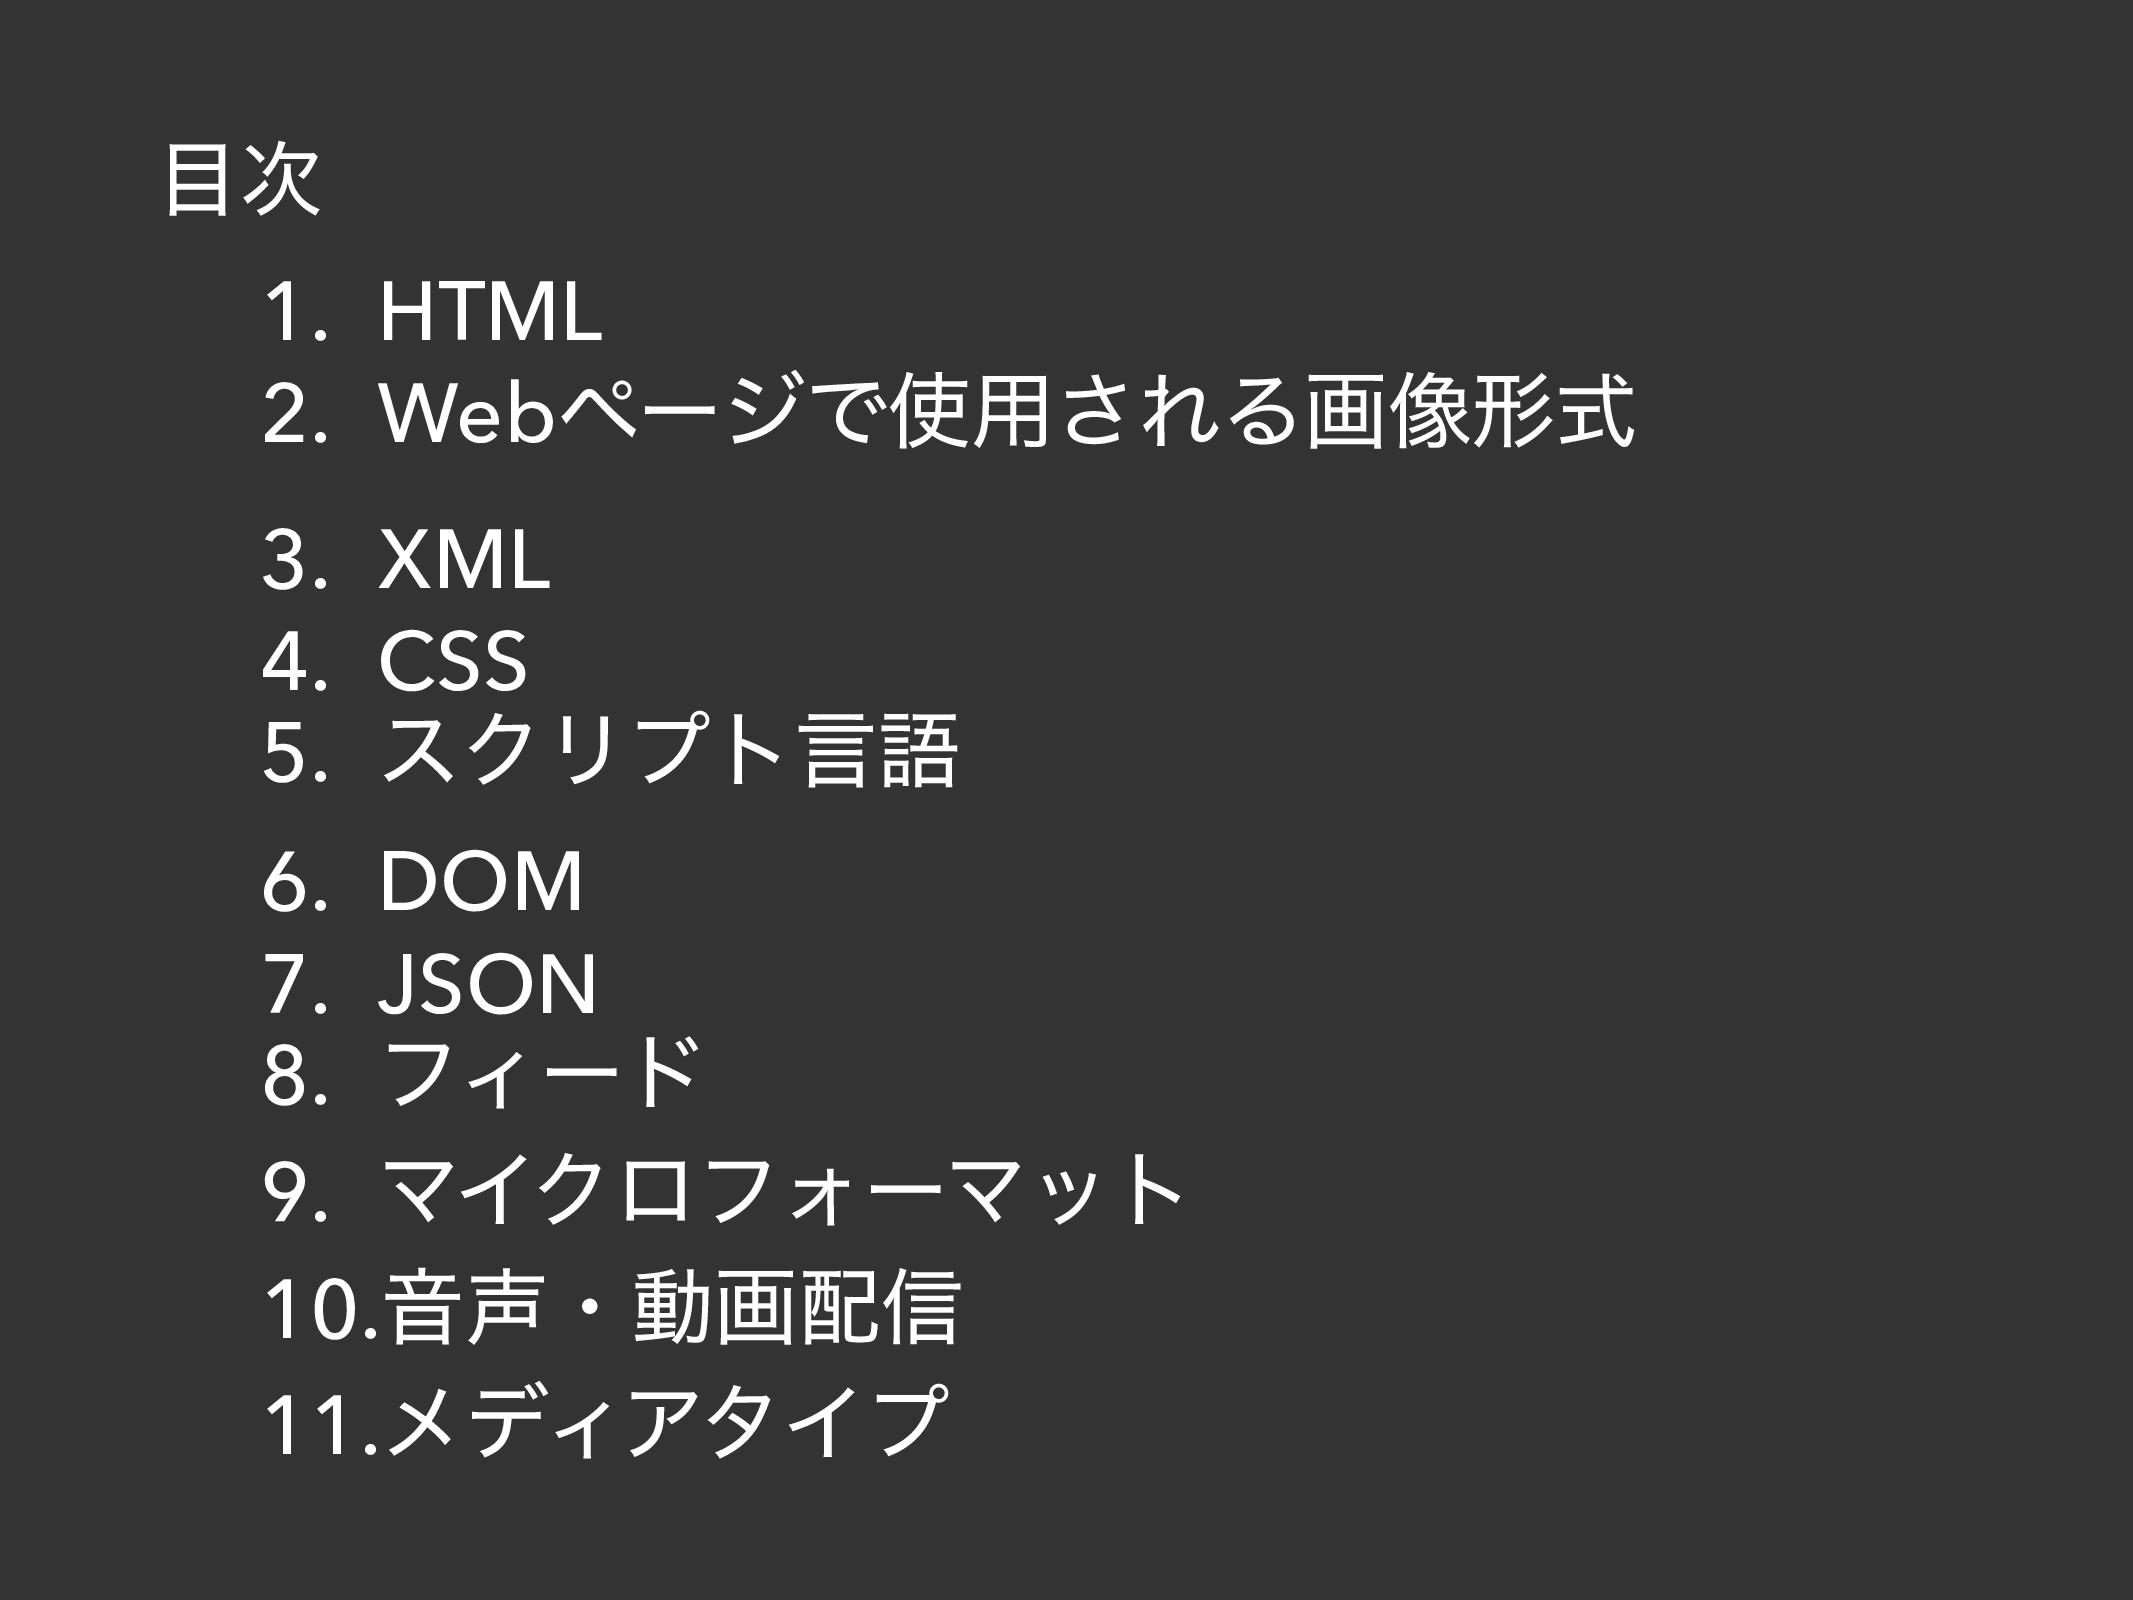  1. HTML 2. WebϖʔδͰ༻͞ΕΔը૾ܗࣜ 3. XML 4. CSS 5....